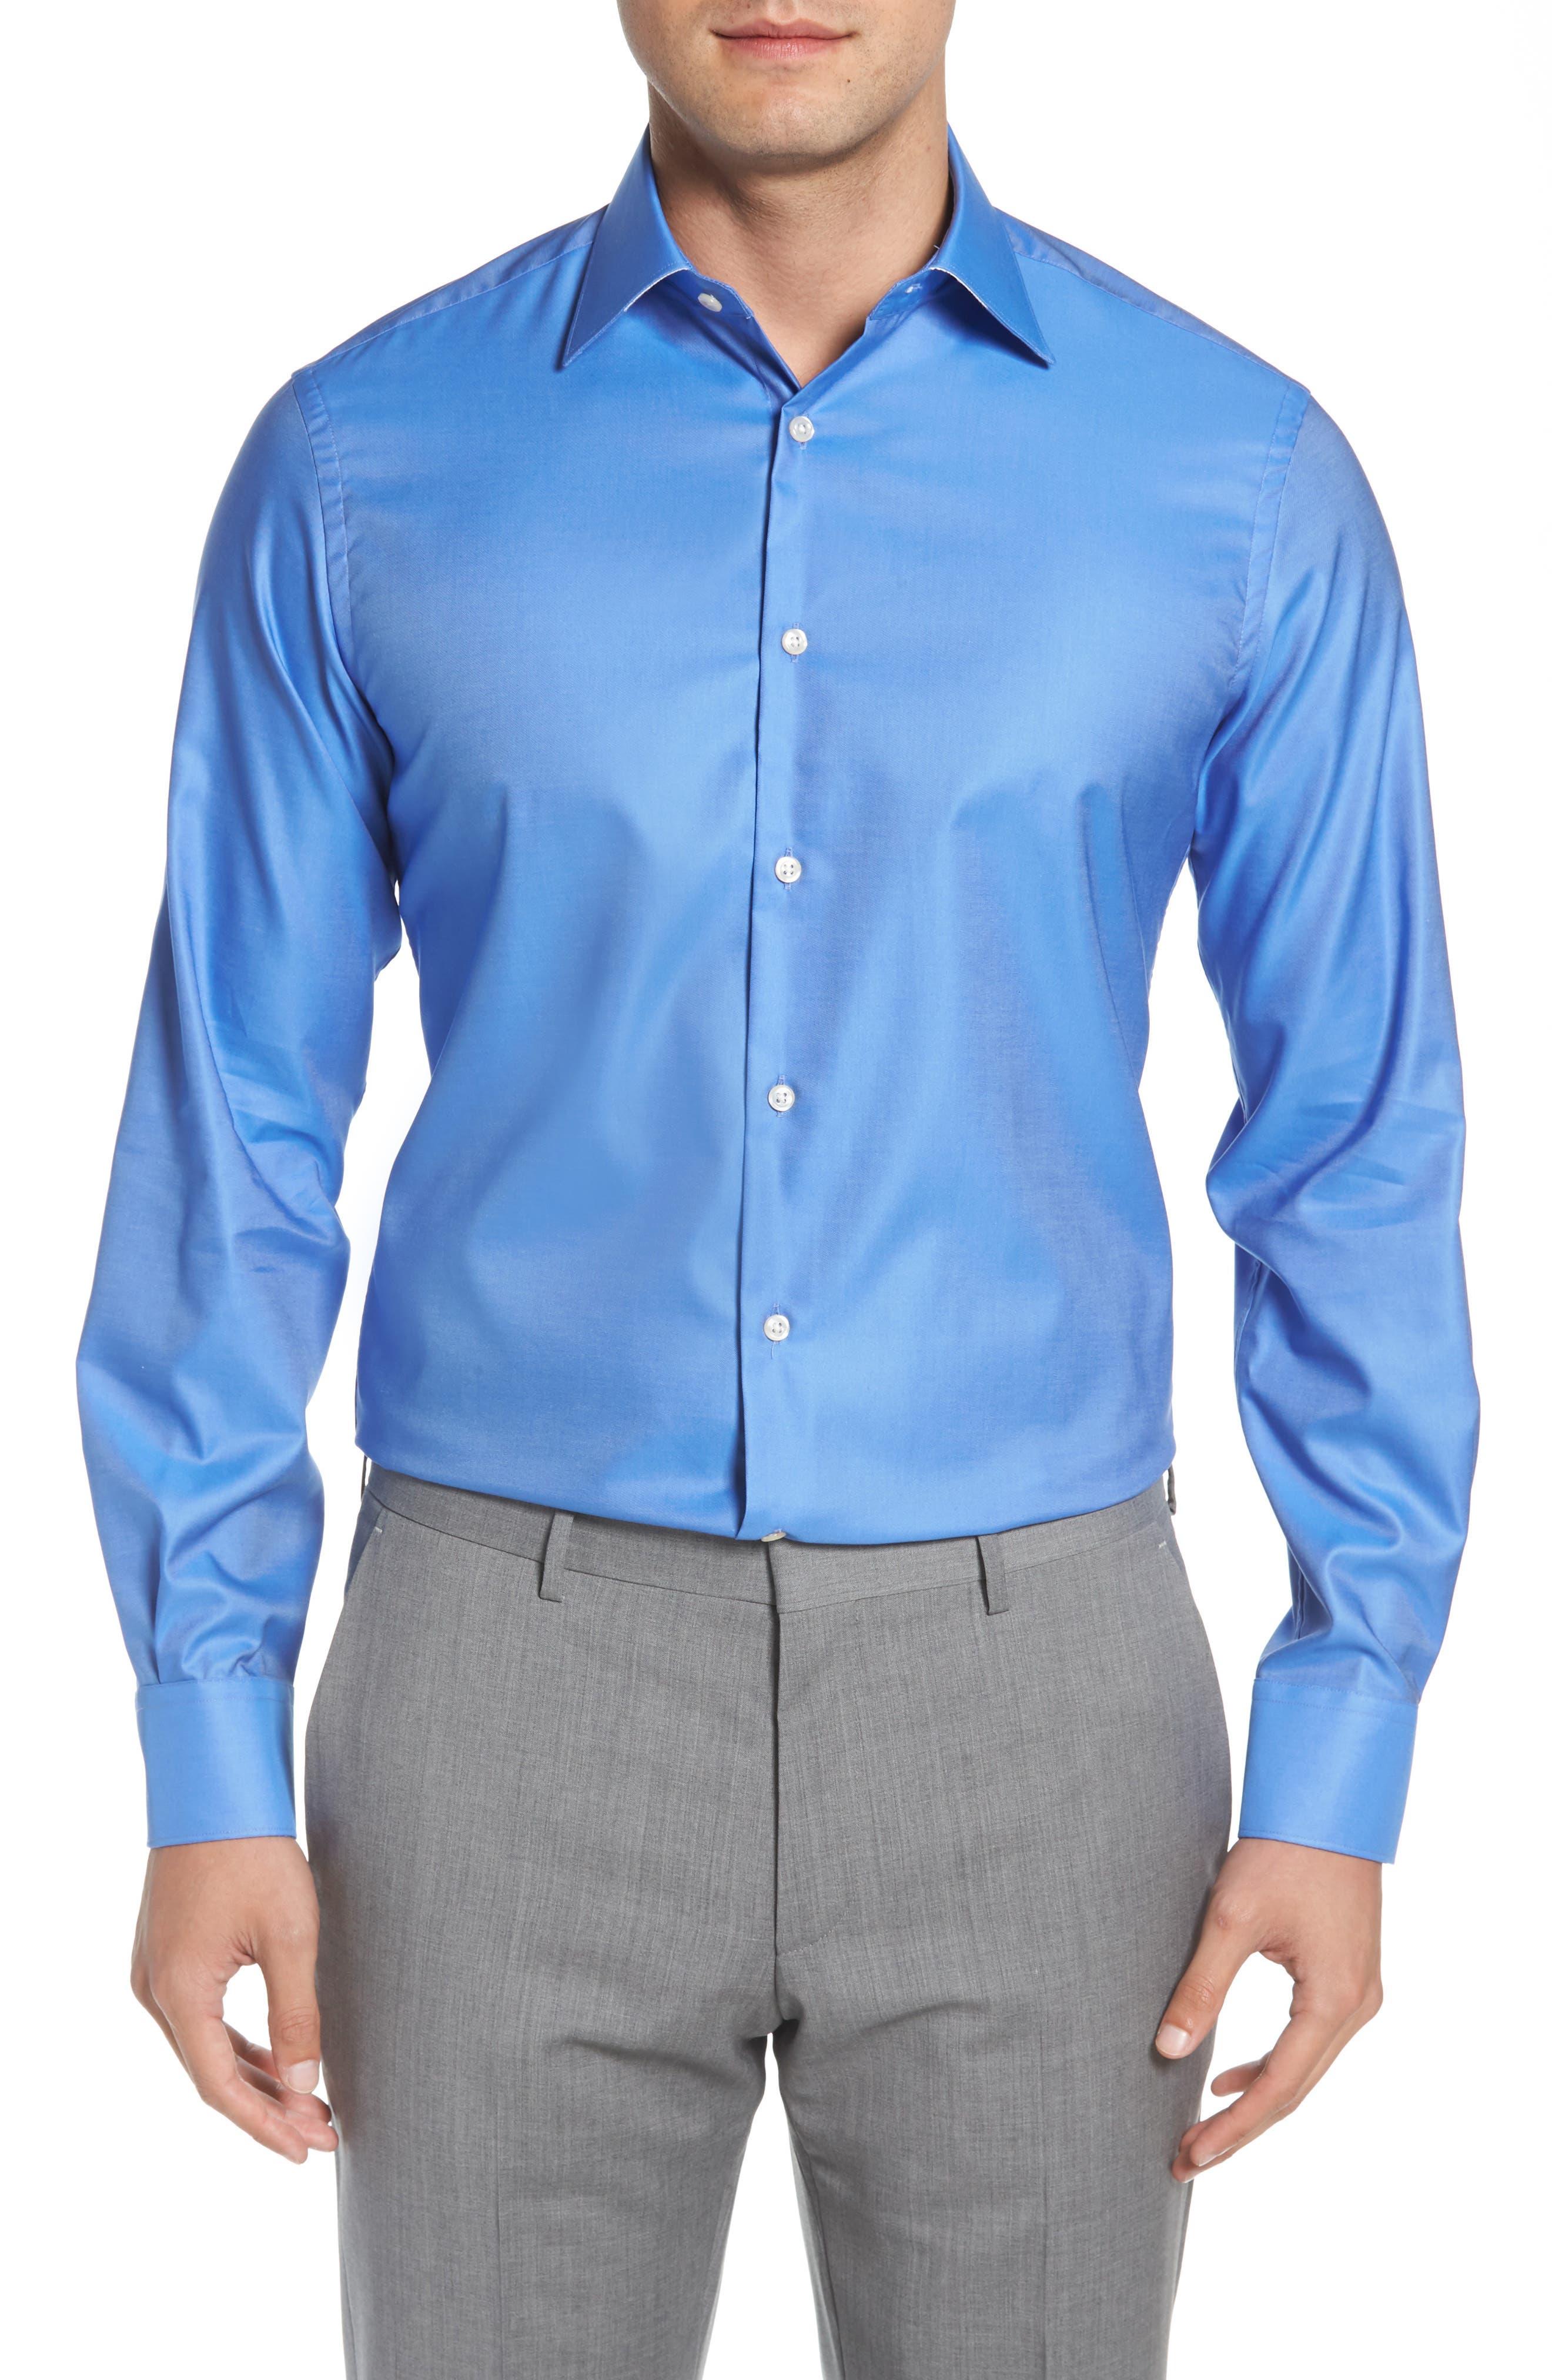 Regular Fit Solid Dress Shirt,                             Main thumbnail 1, color,                             DARK BLUE